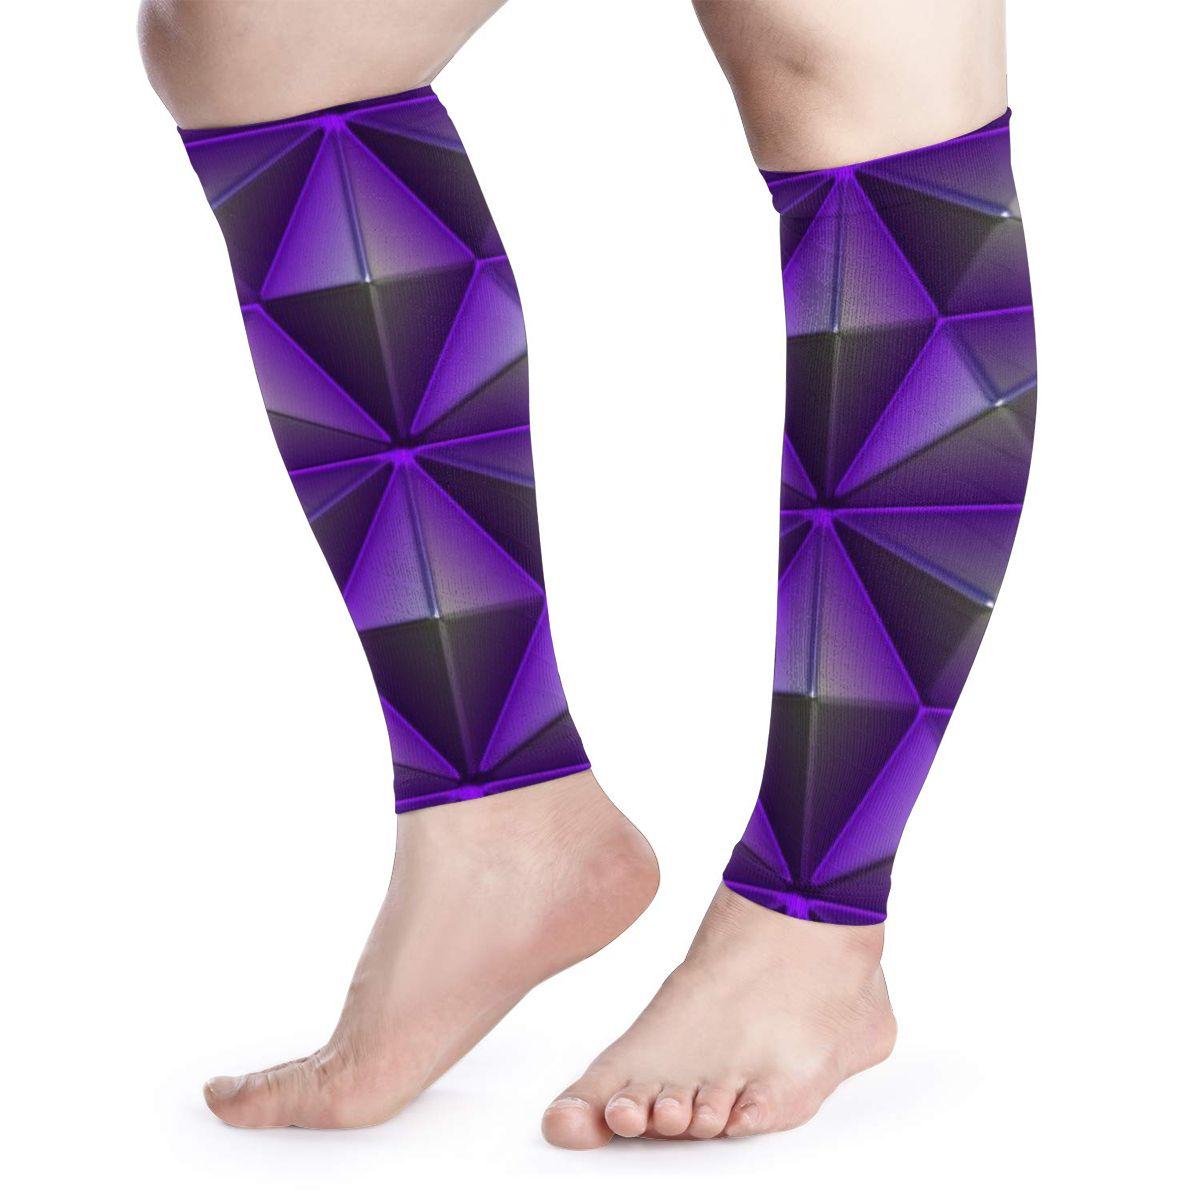 NOISYDESIGNS A Pair Calf Protecctor Sleeves Purple Geometric Print Elastic Shin Guard Protector Leg Warmers Sport Equipment